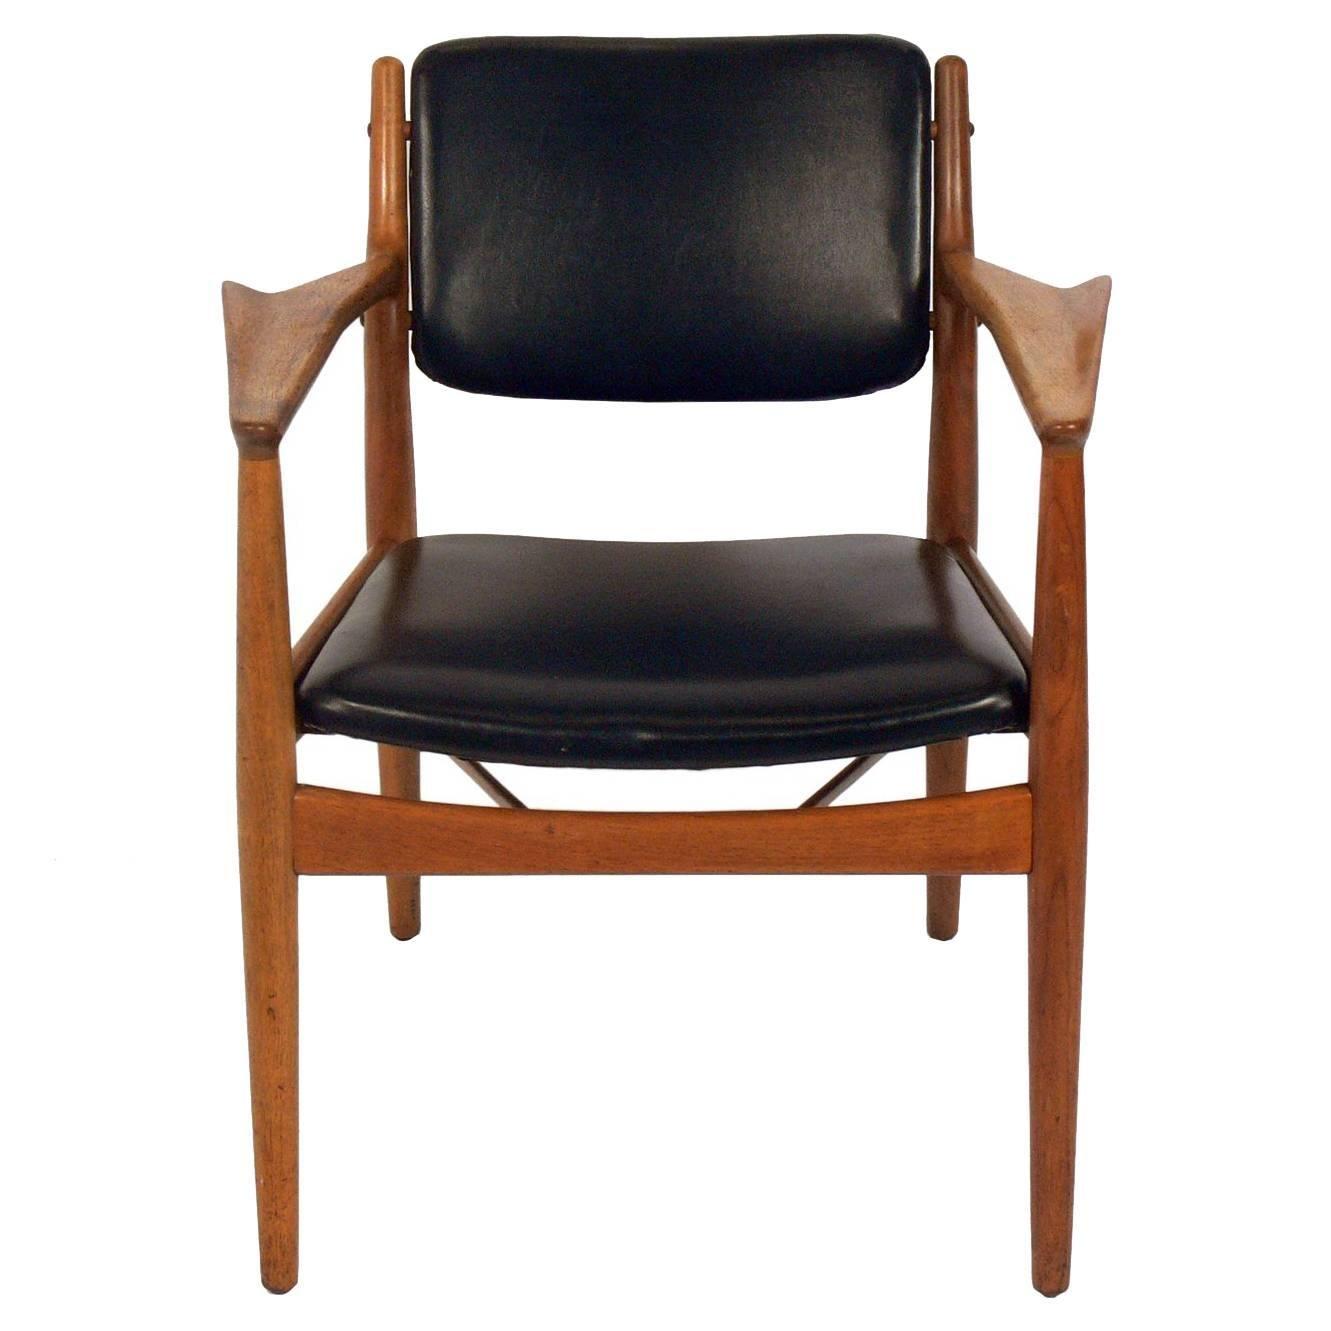 Sculptural Danish Modern Lounge Chair by Arne Vodder